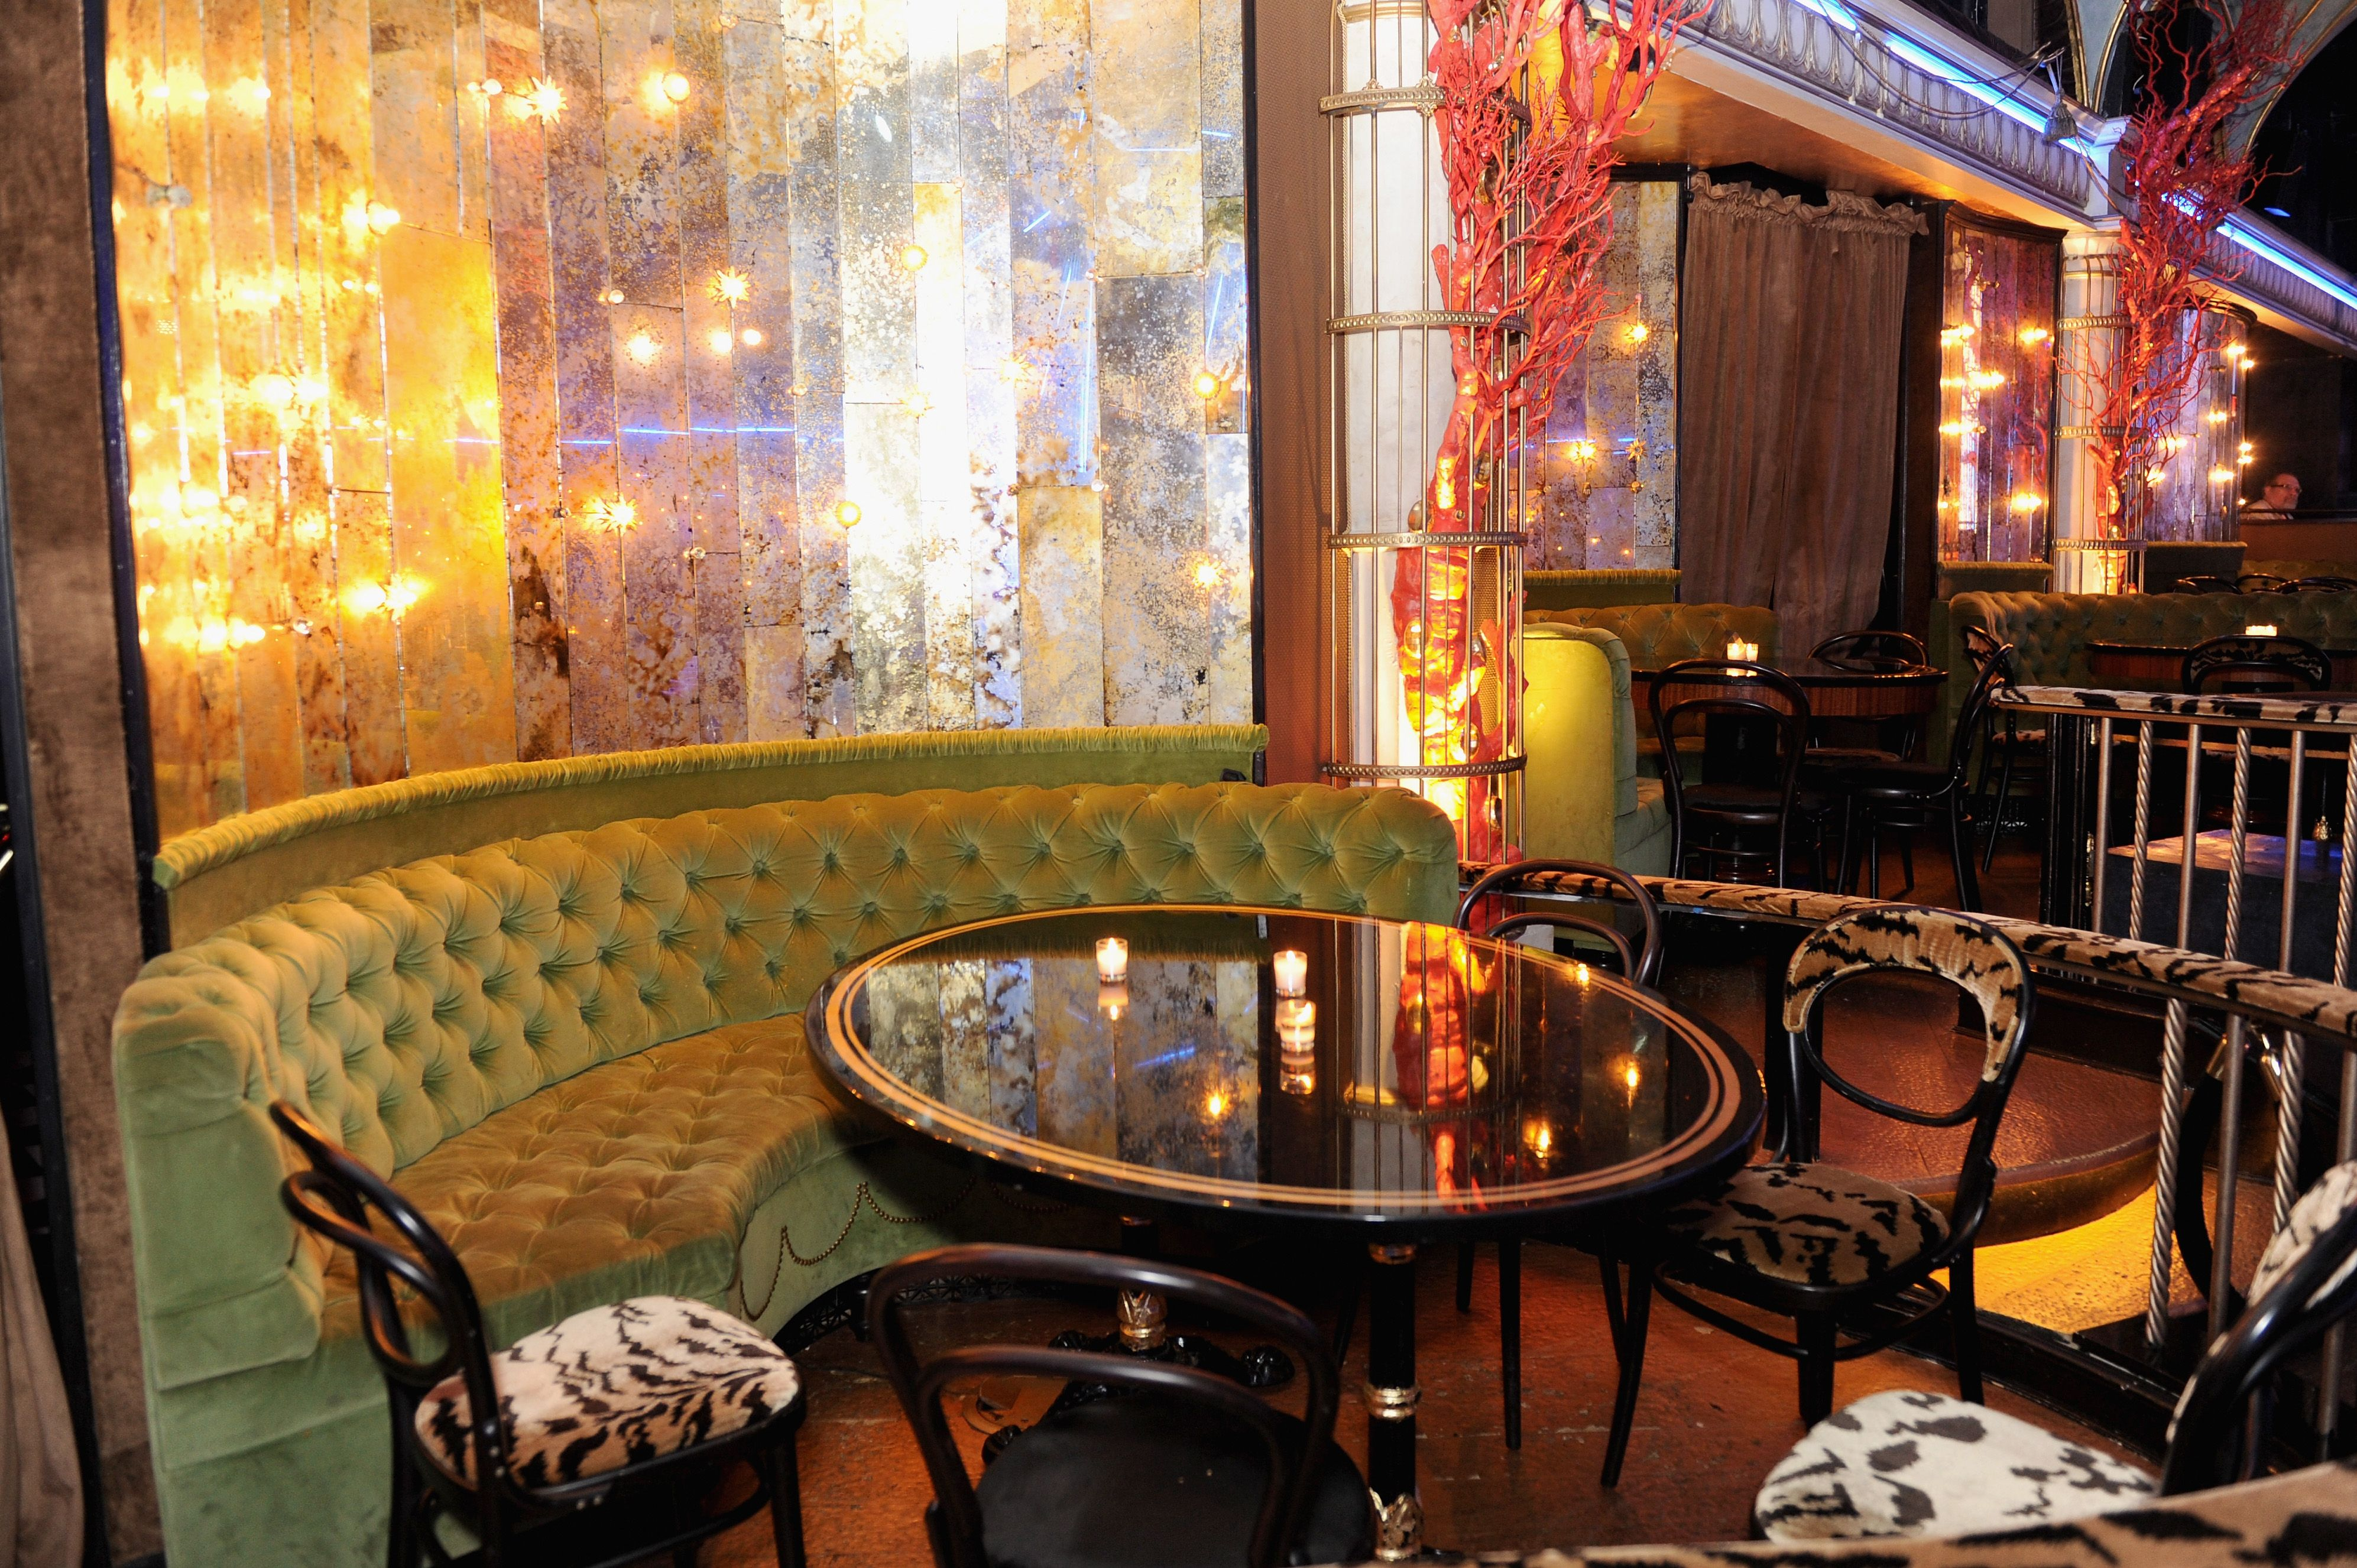 A general view of Paramount Hotel's Diamond Horseshoe at the 2014 Tony Honors Cocktail Party. (Photo by Craig Barritt/Getty Images for Tony Awards Productions) #TonyAwards cc @The Tony Awards